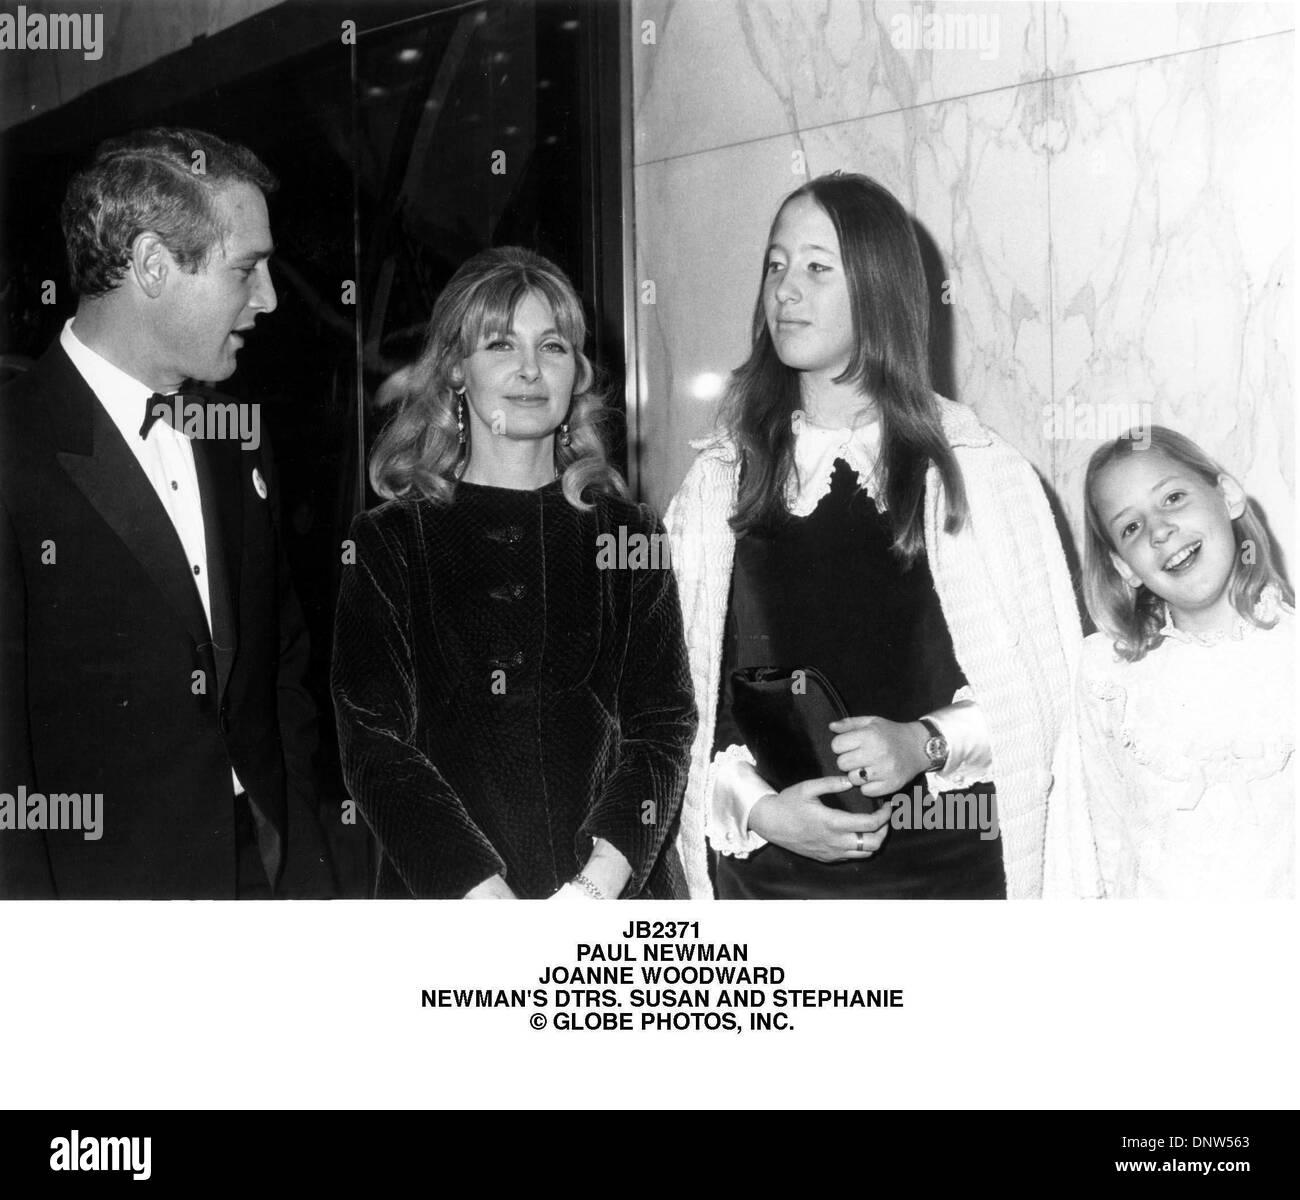 Jan. 1, 2001 - JB2371.PAUL NEWMAN.JOANNE WOODWARD.NEWMAN'S ...